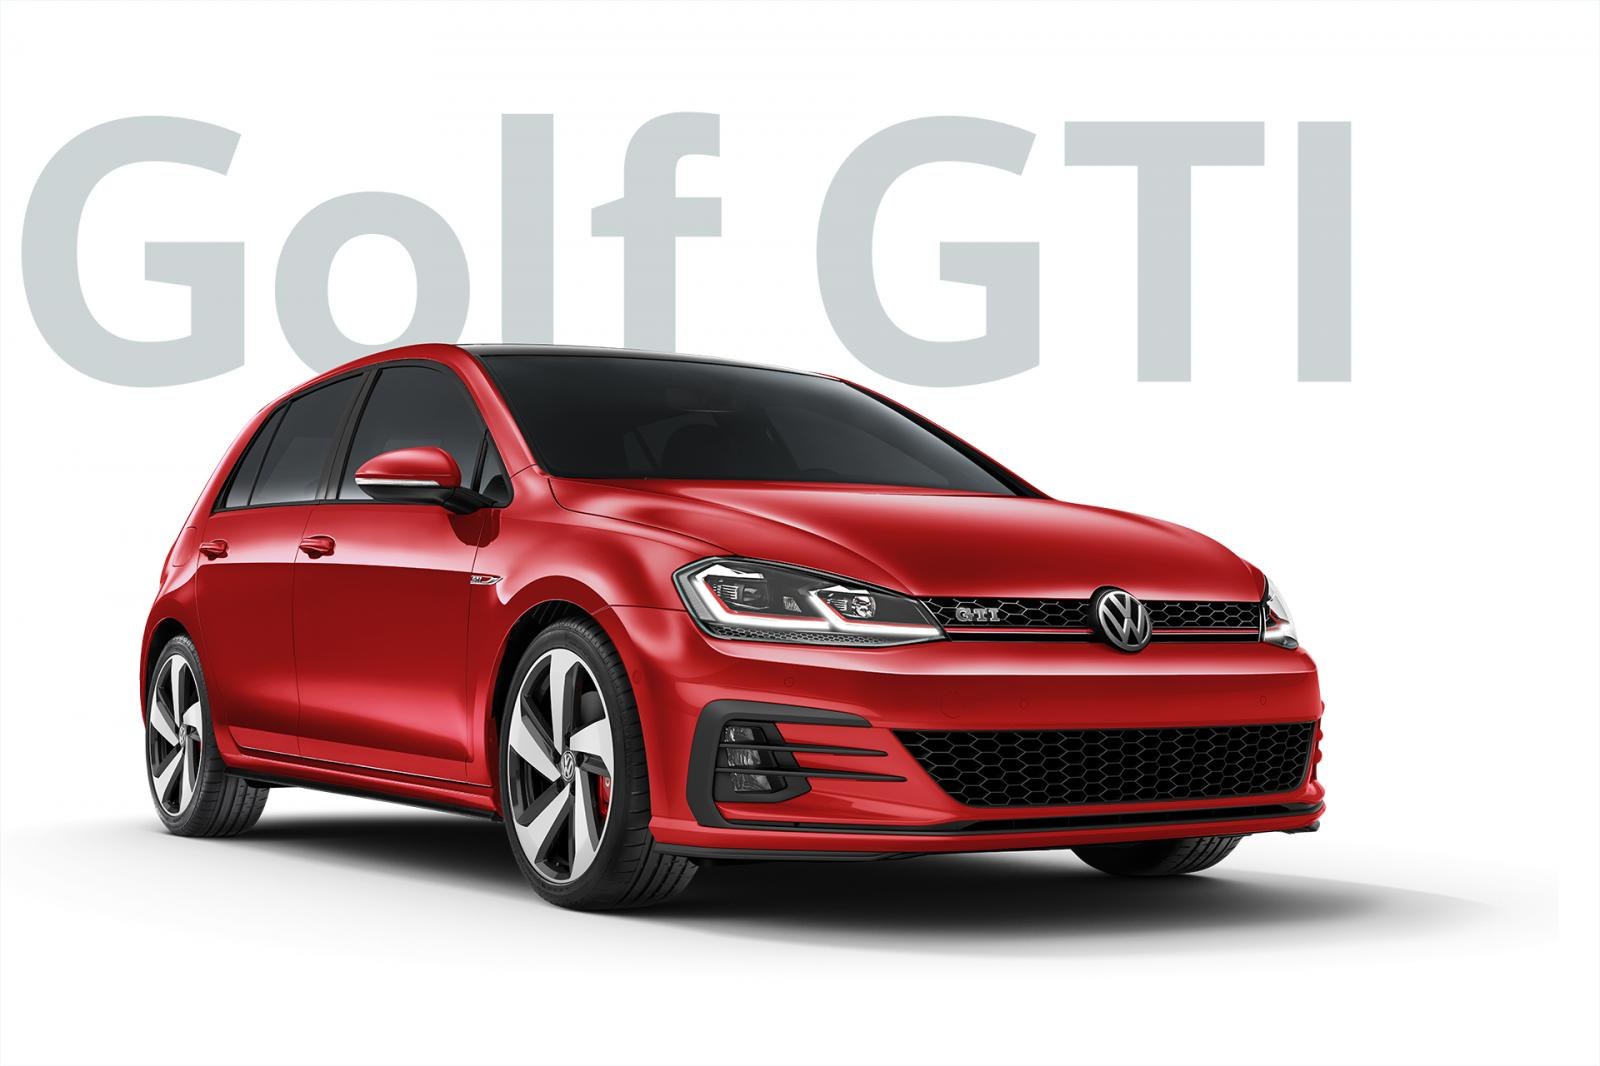 2018 VW Golf GTI photo gallery